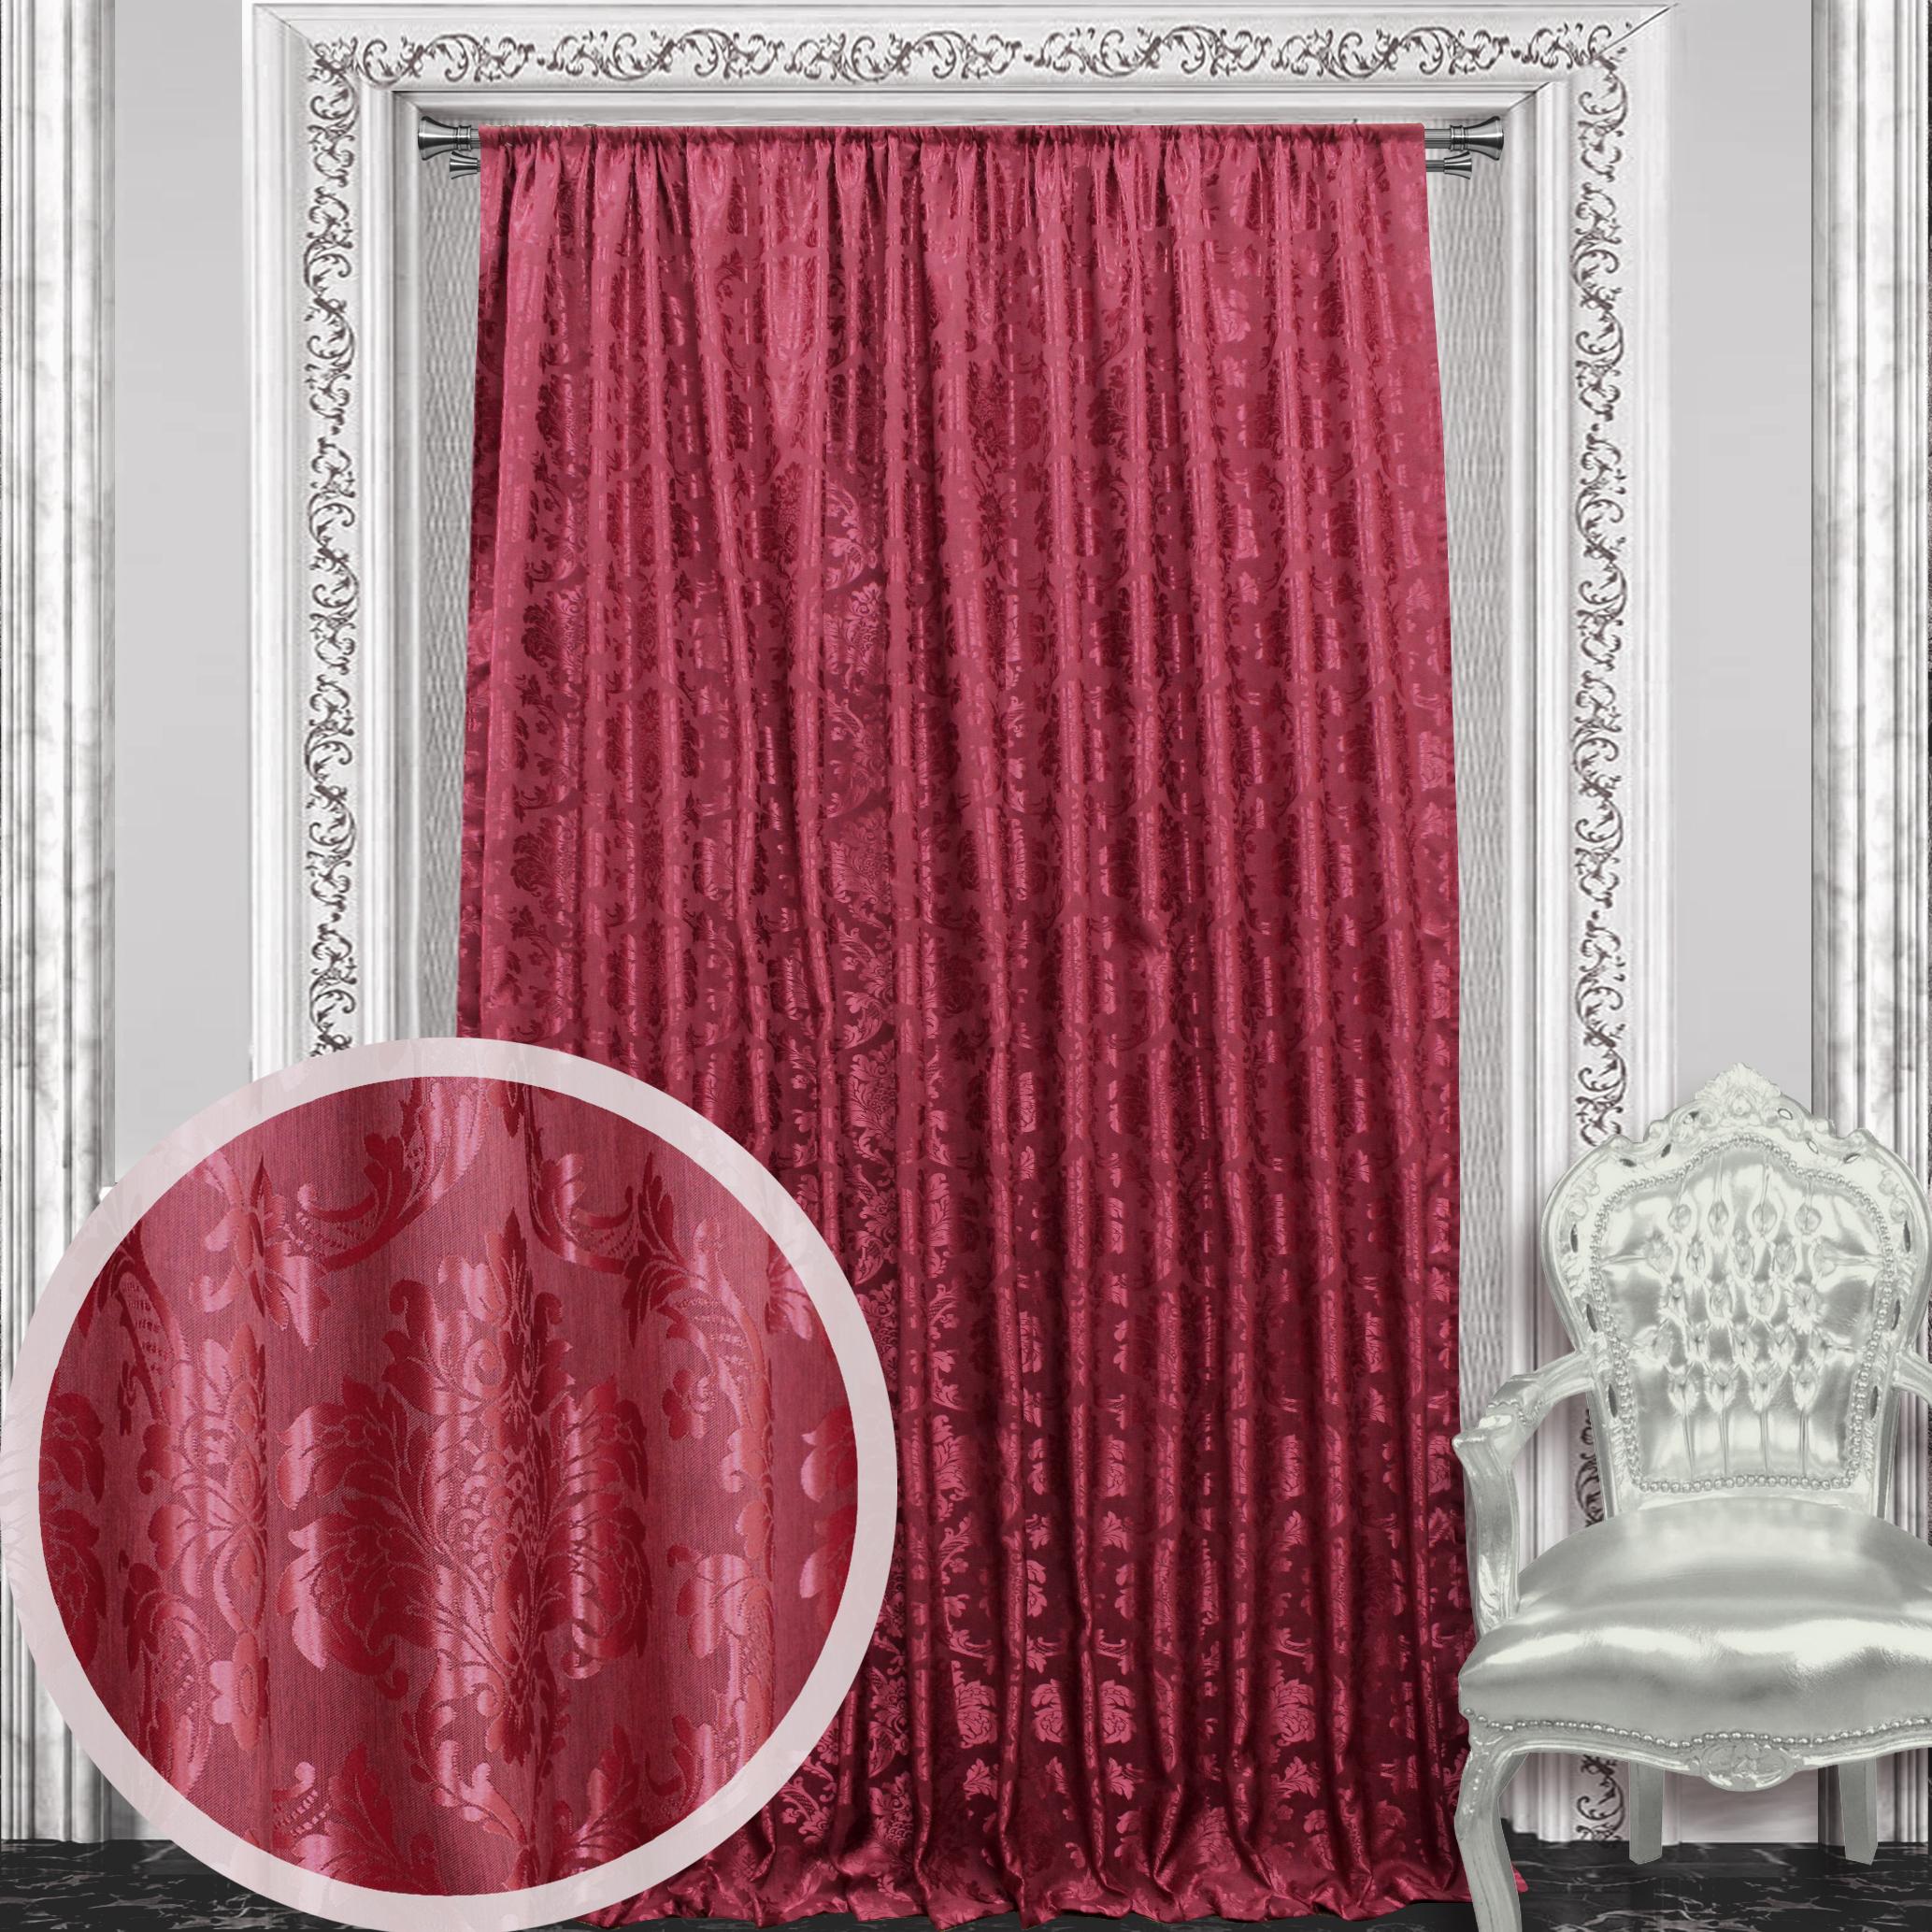 Шторы Amore Mio Классические шторы Janessa Цвет: Бордовый